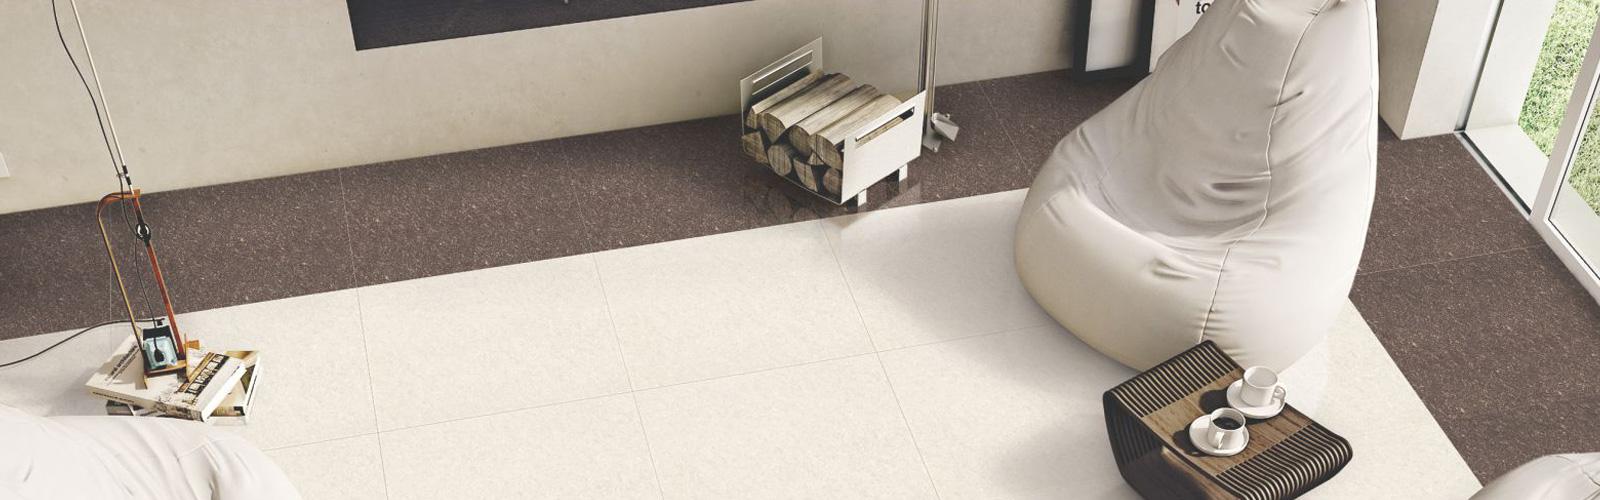 Alfanso Vitrified Tiles Pvt. Ltd.